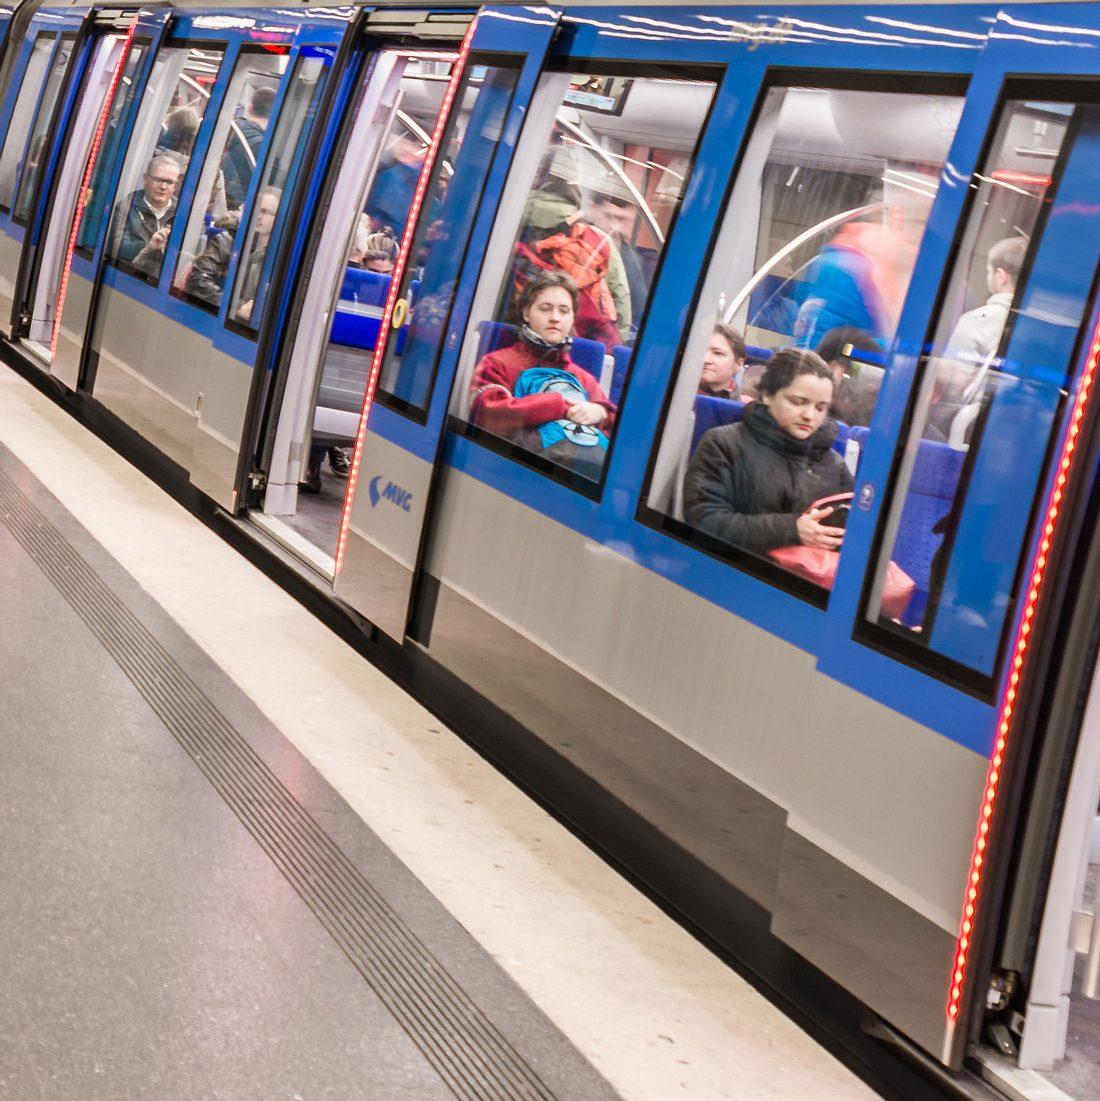 Paar hat Sex in Münchner U-Bahn